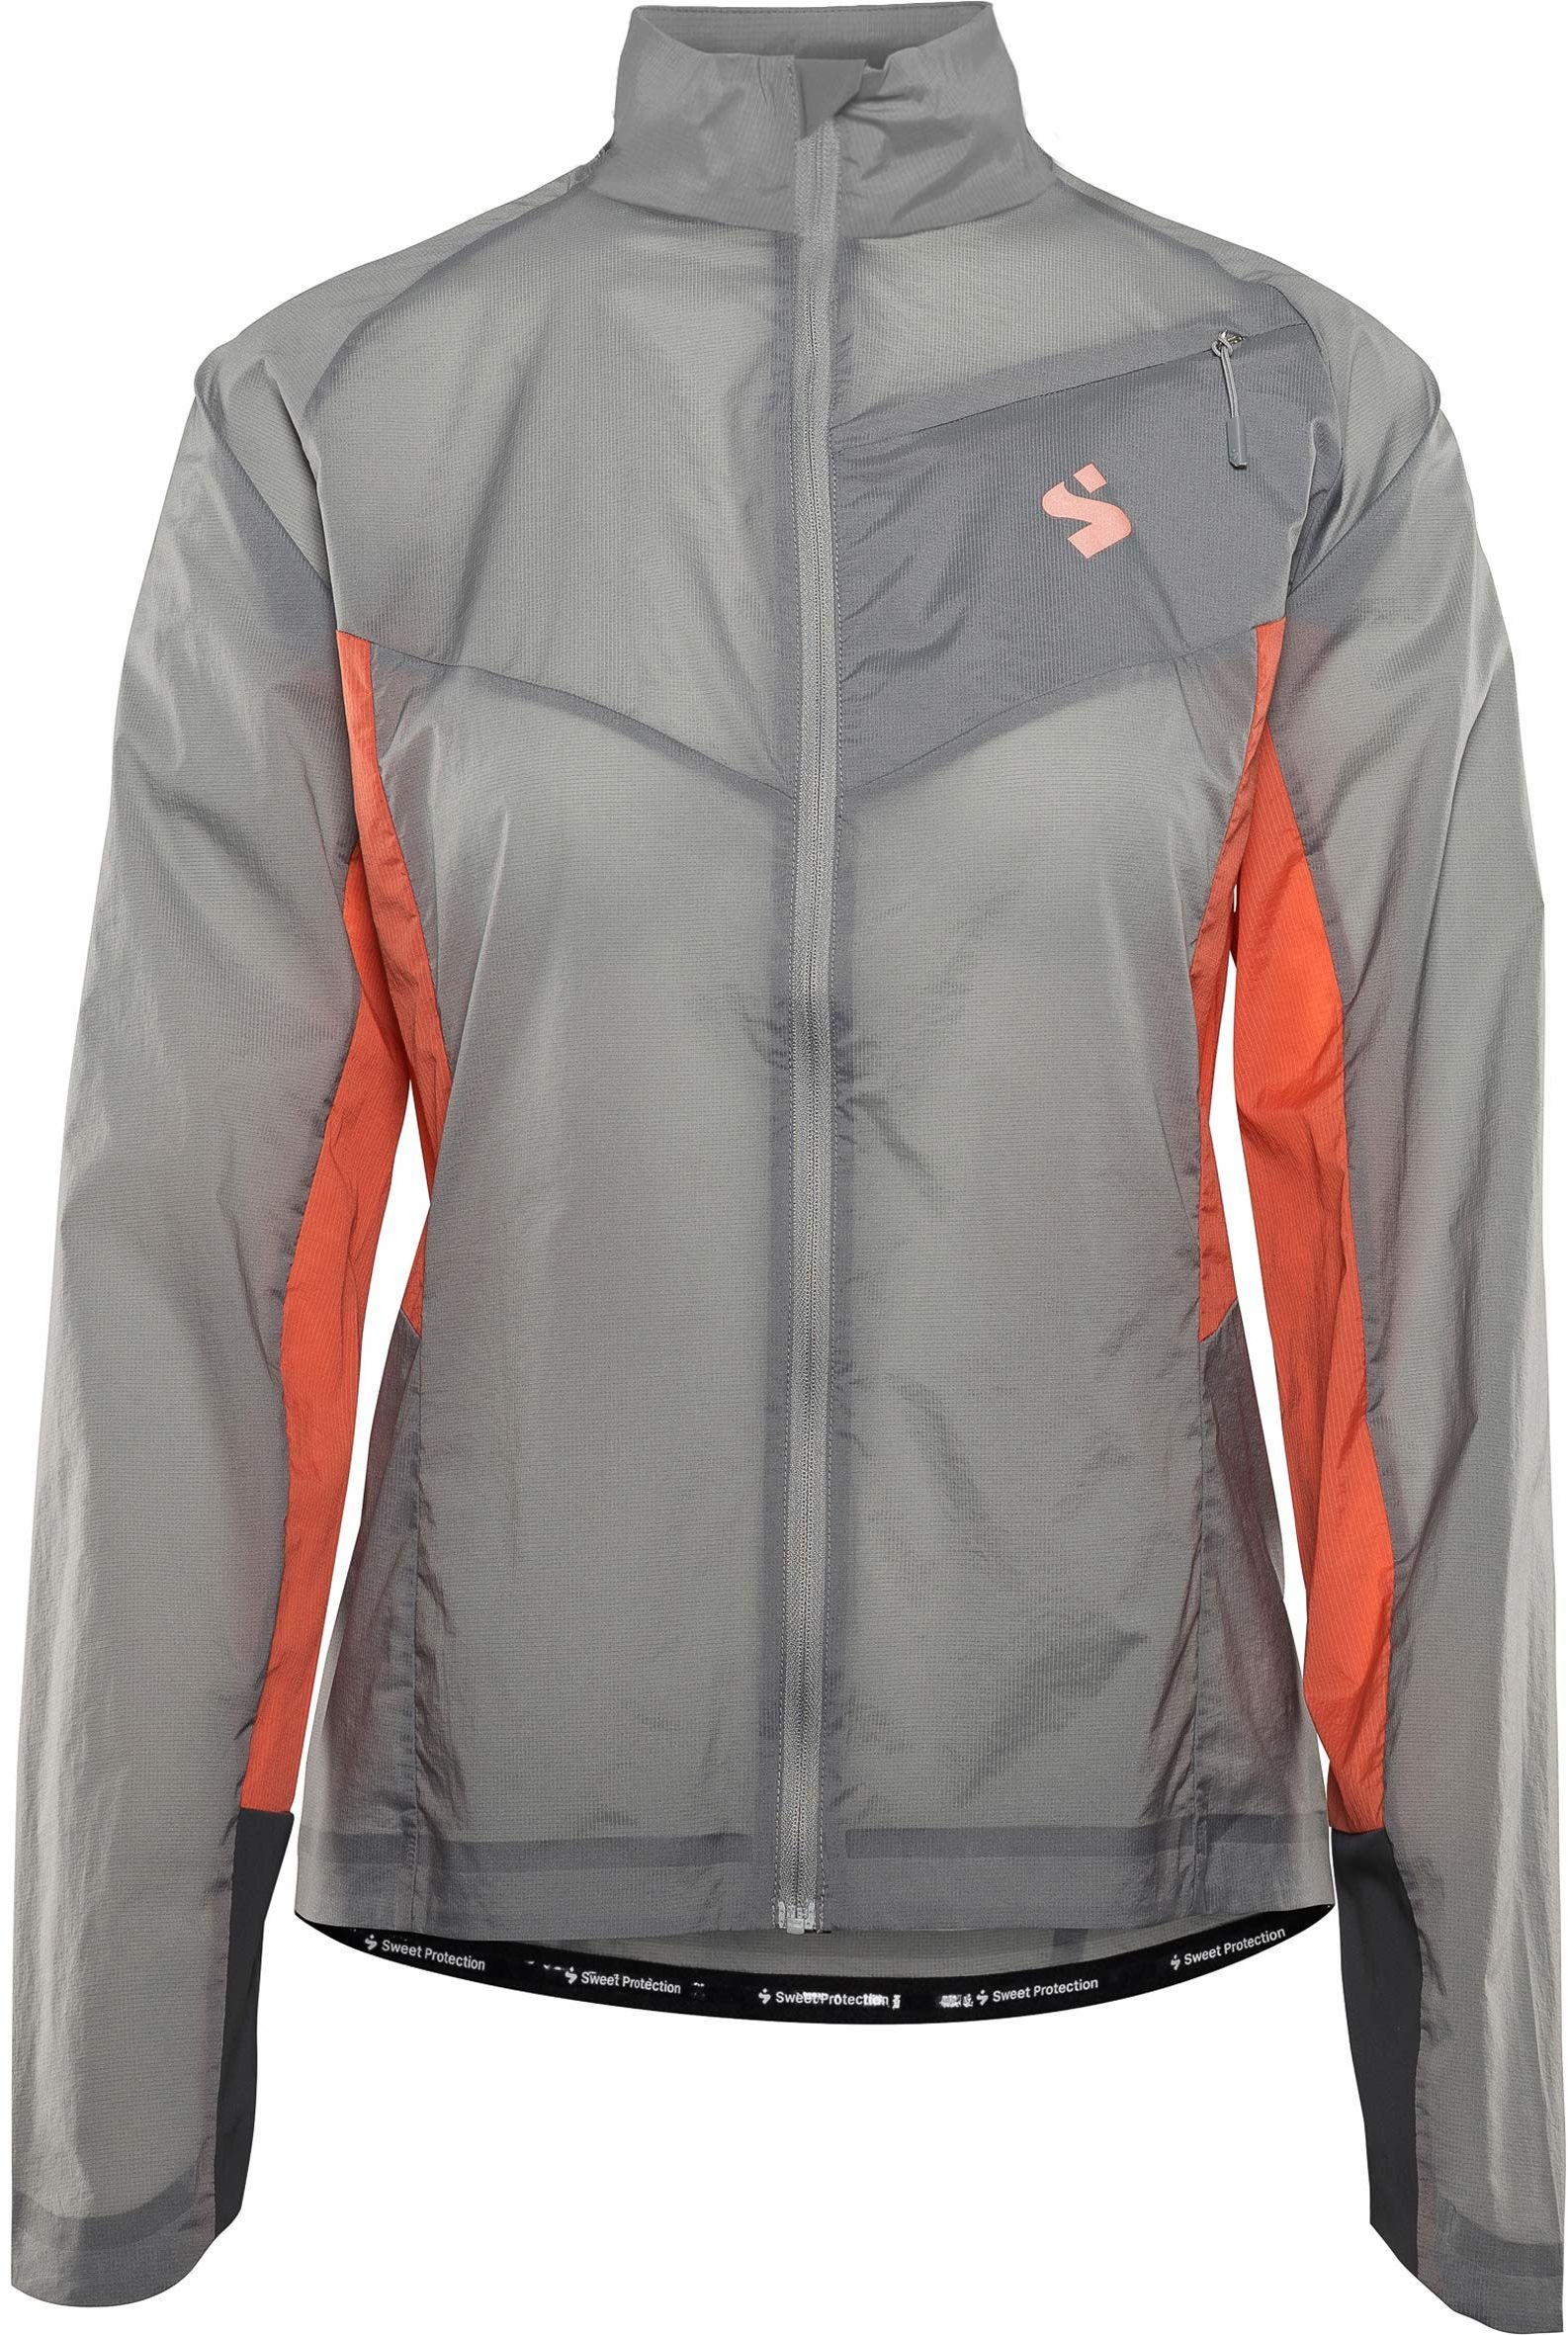 Sweet Protection Hunter Wind Jacket W, Light Gray, XS